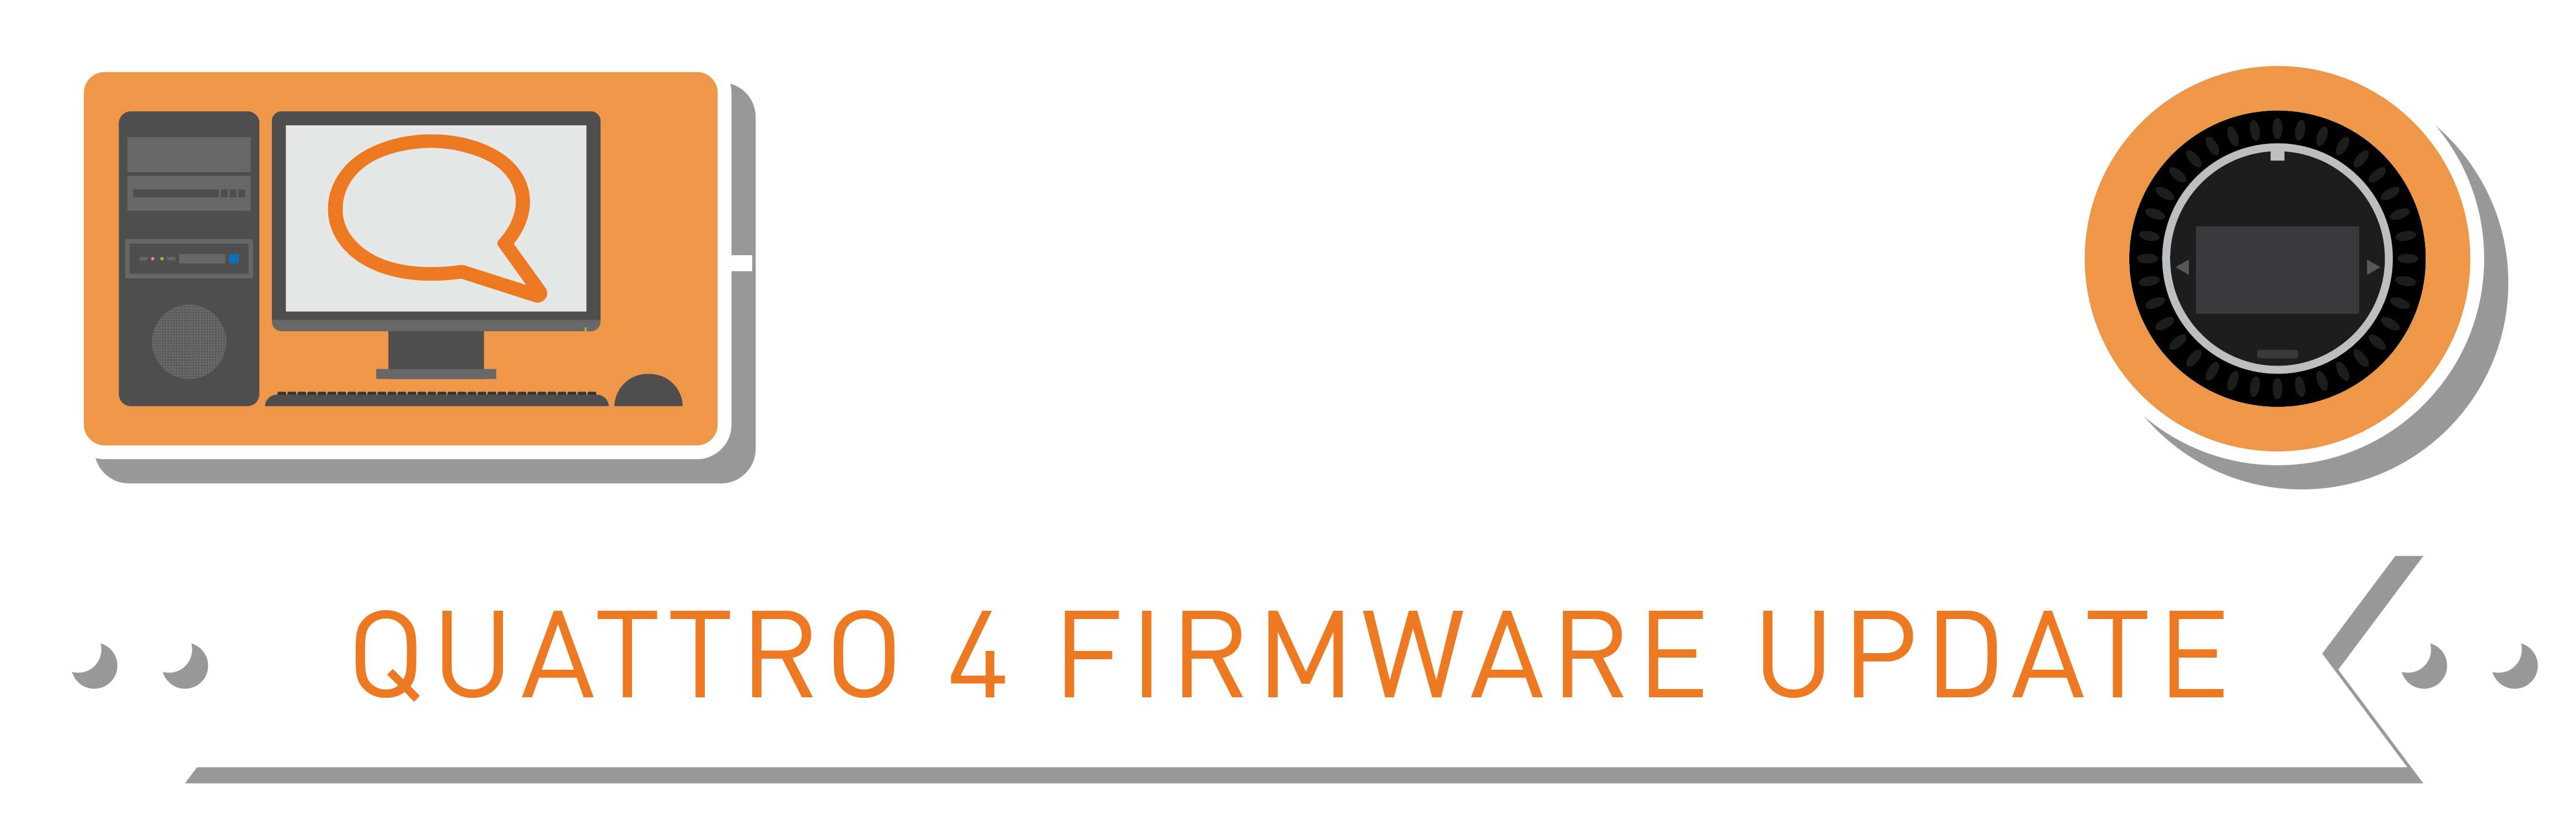 Quattro 4 Firmware Update